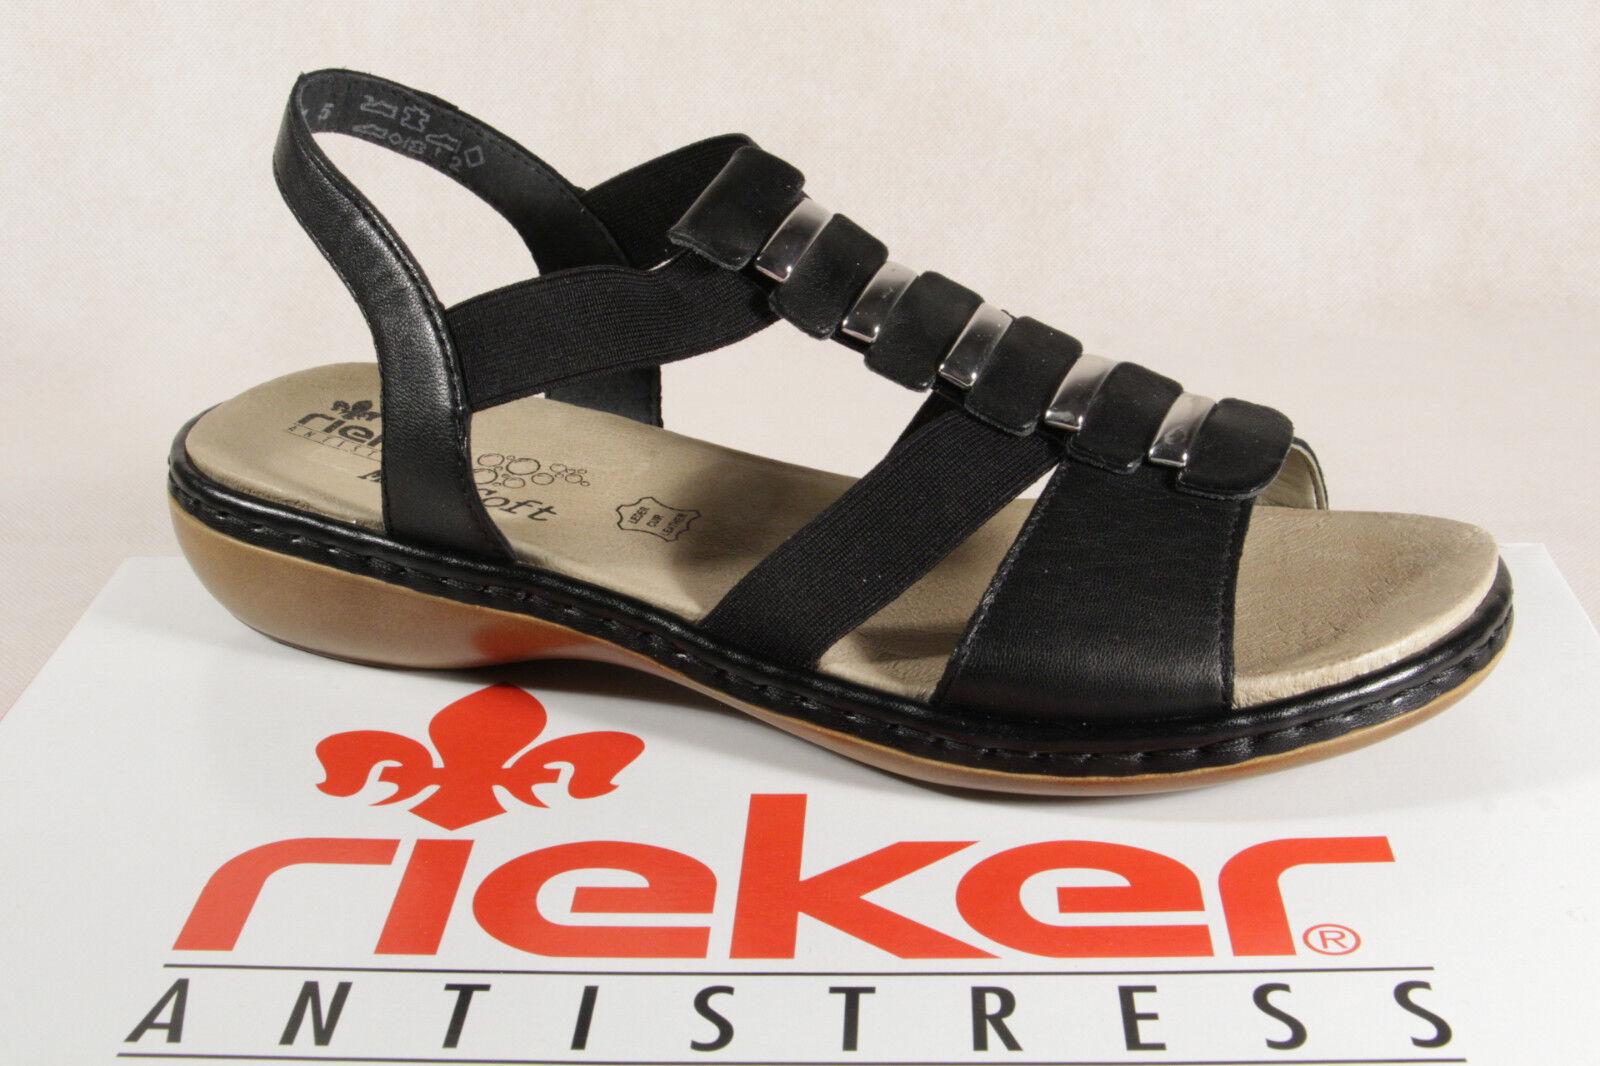 Rieker Ladies Sandals Sneakers Black Footbed Real Leather New